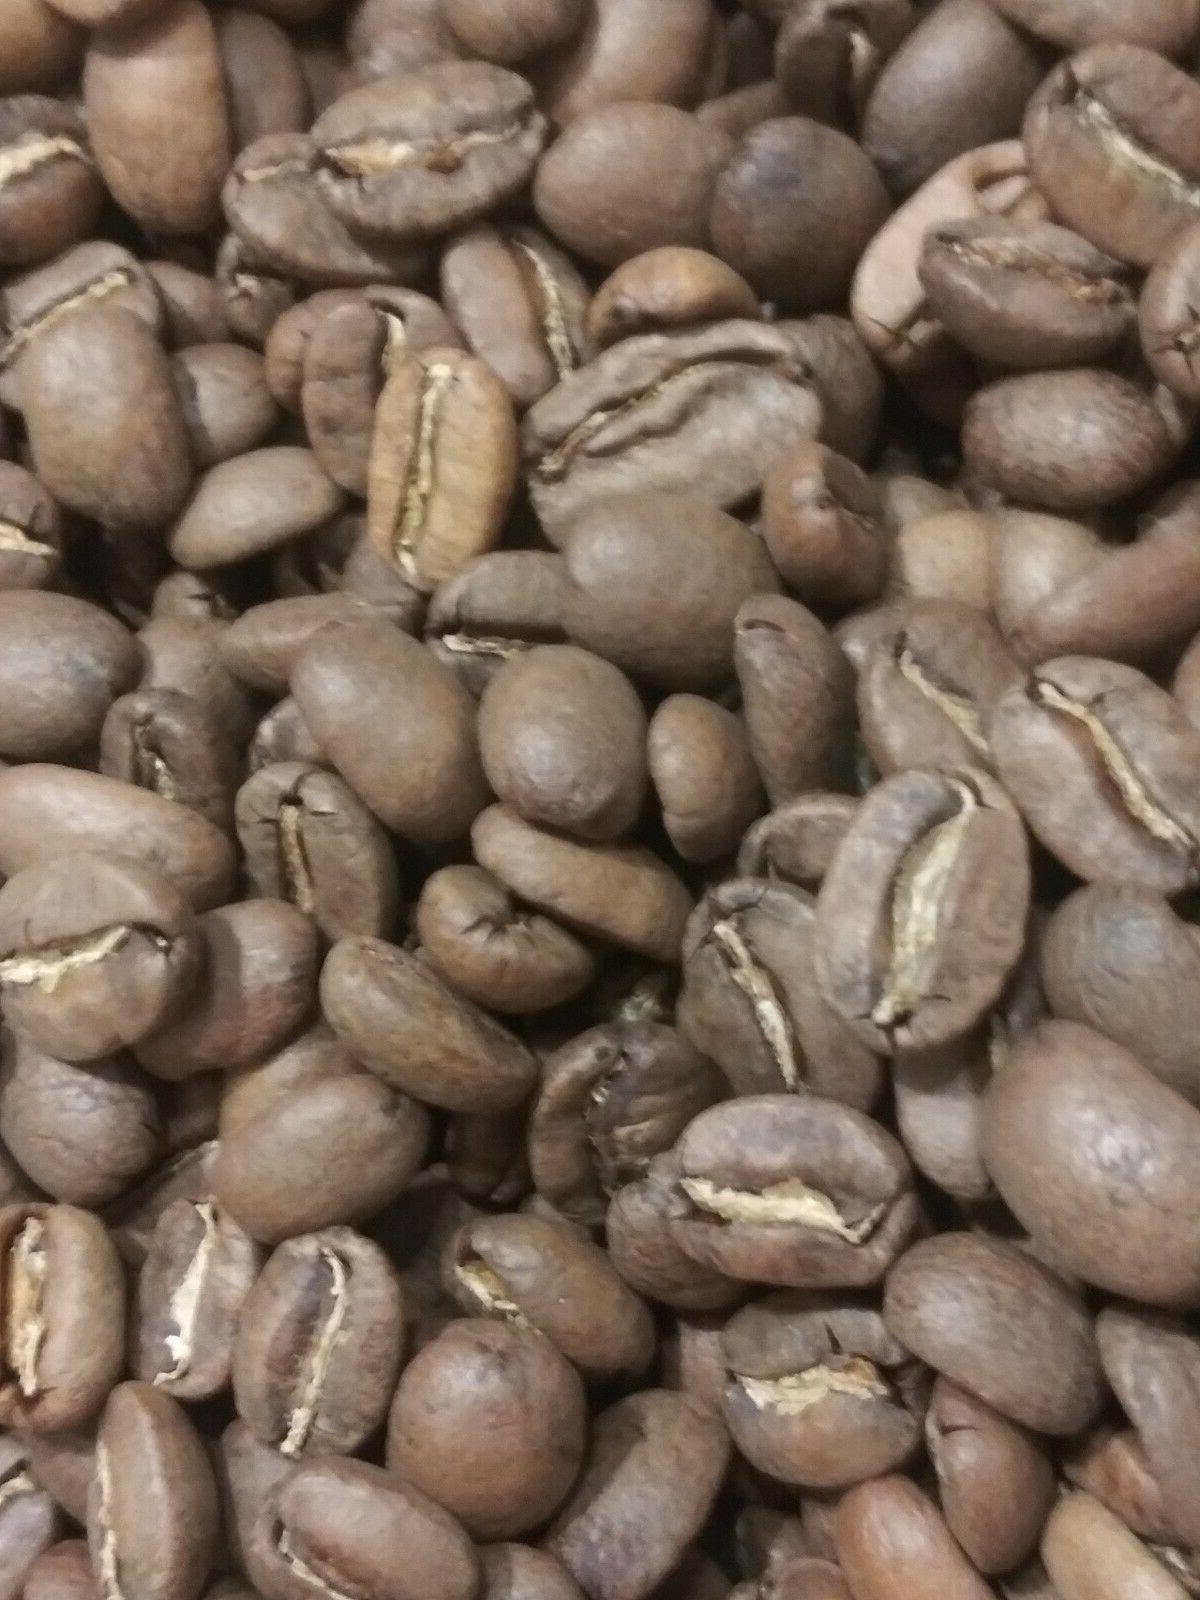 roasted coffee beans 24 oz bag papua